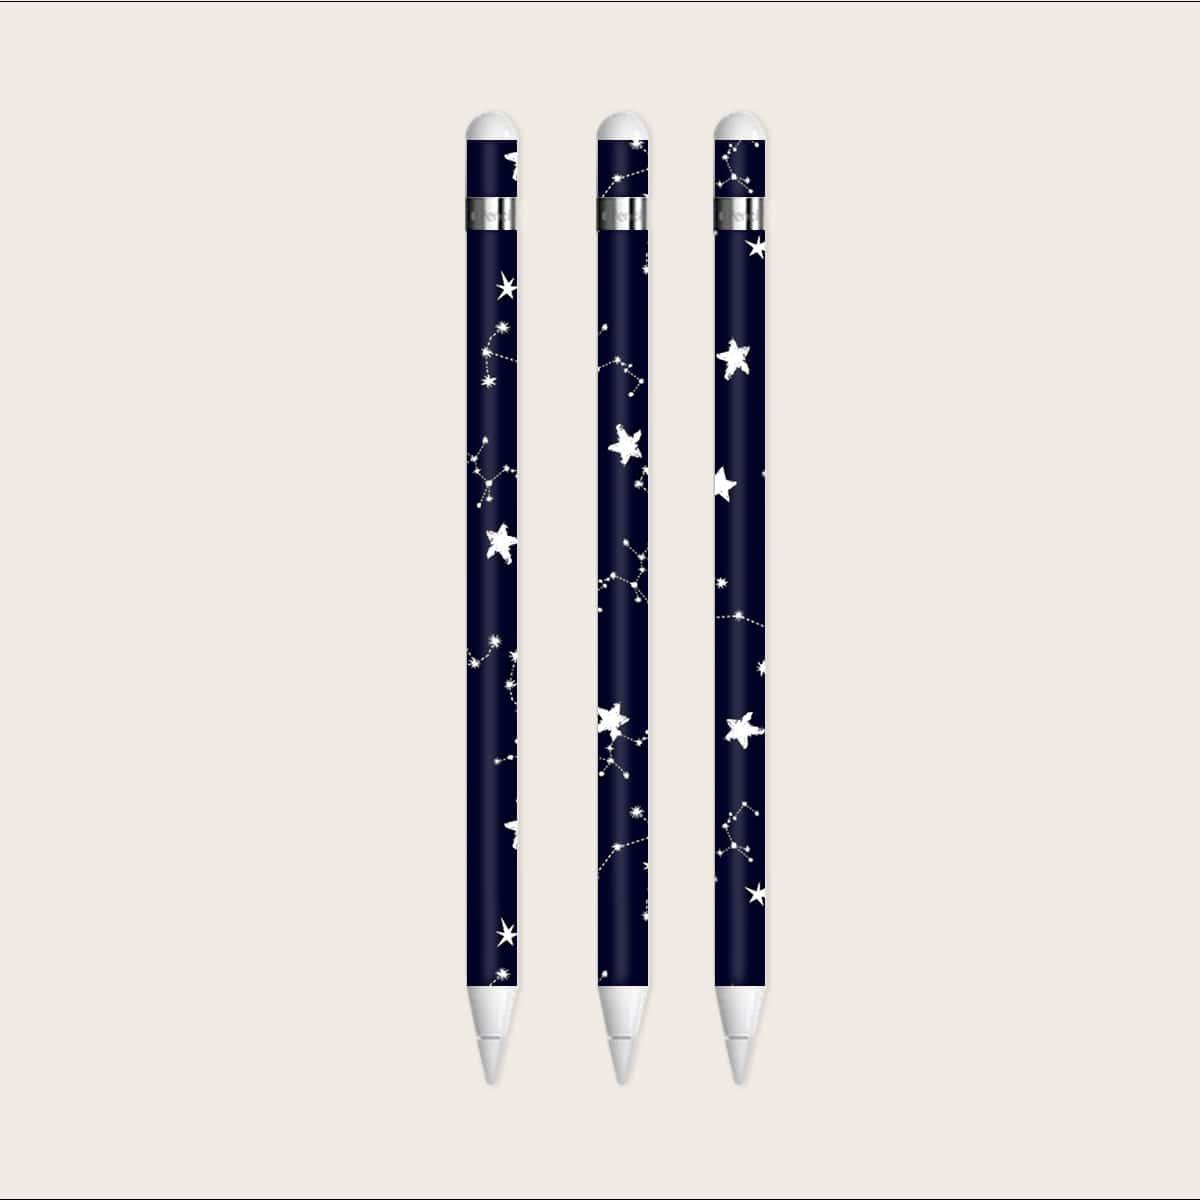 1 лист наклейка для Apple Pencil 1st  с узором звезды